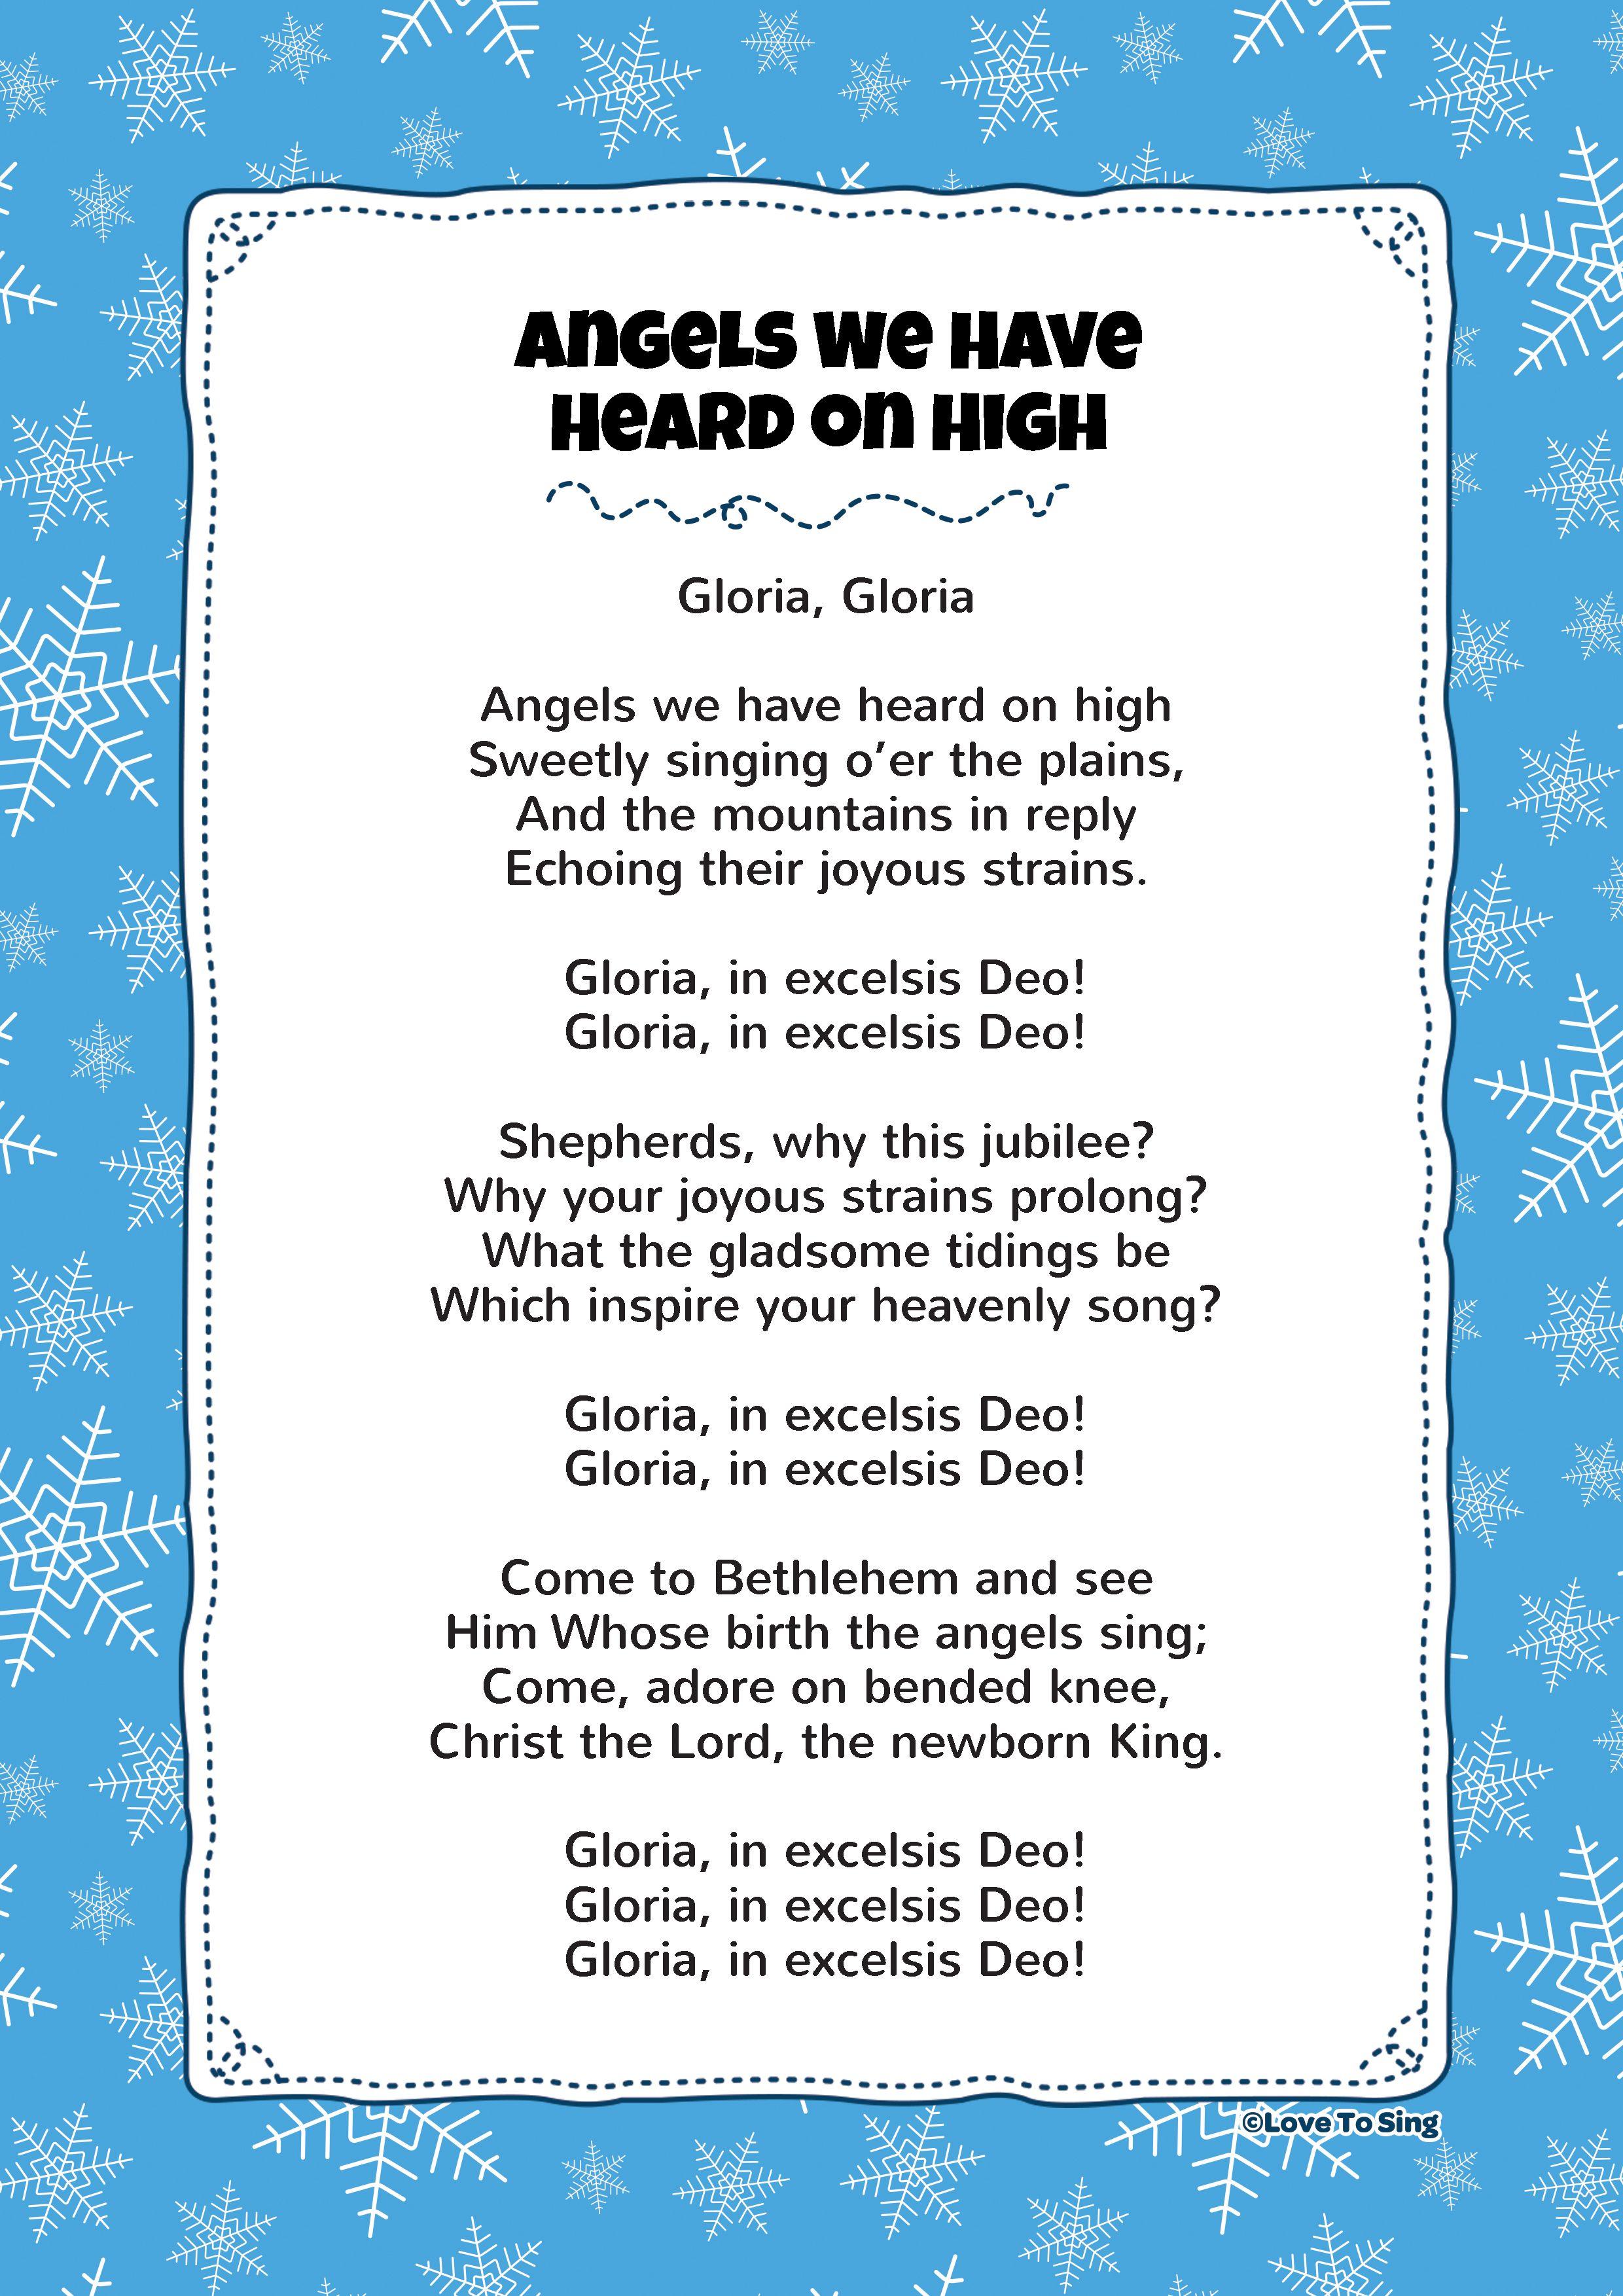 48 Christmas Song Lyrics And Carols Lyrics Ideas Christmas Songs Lyrics Carol Lyrics Christmas Song